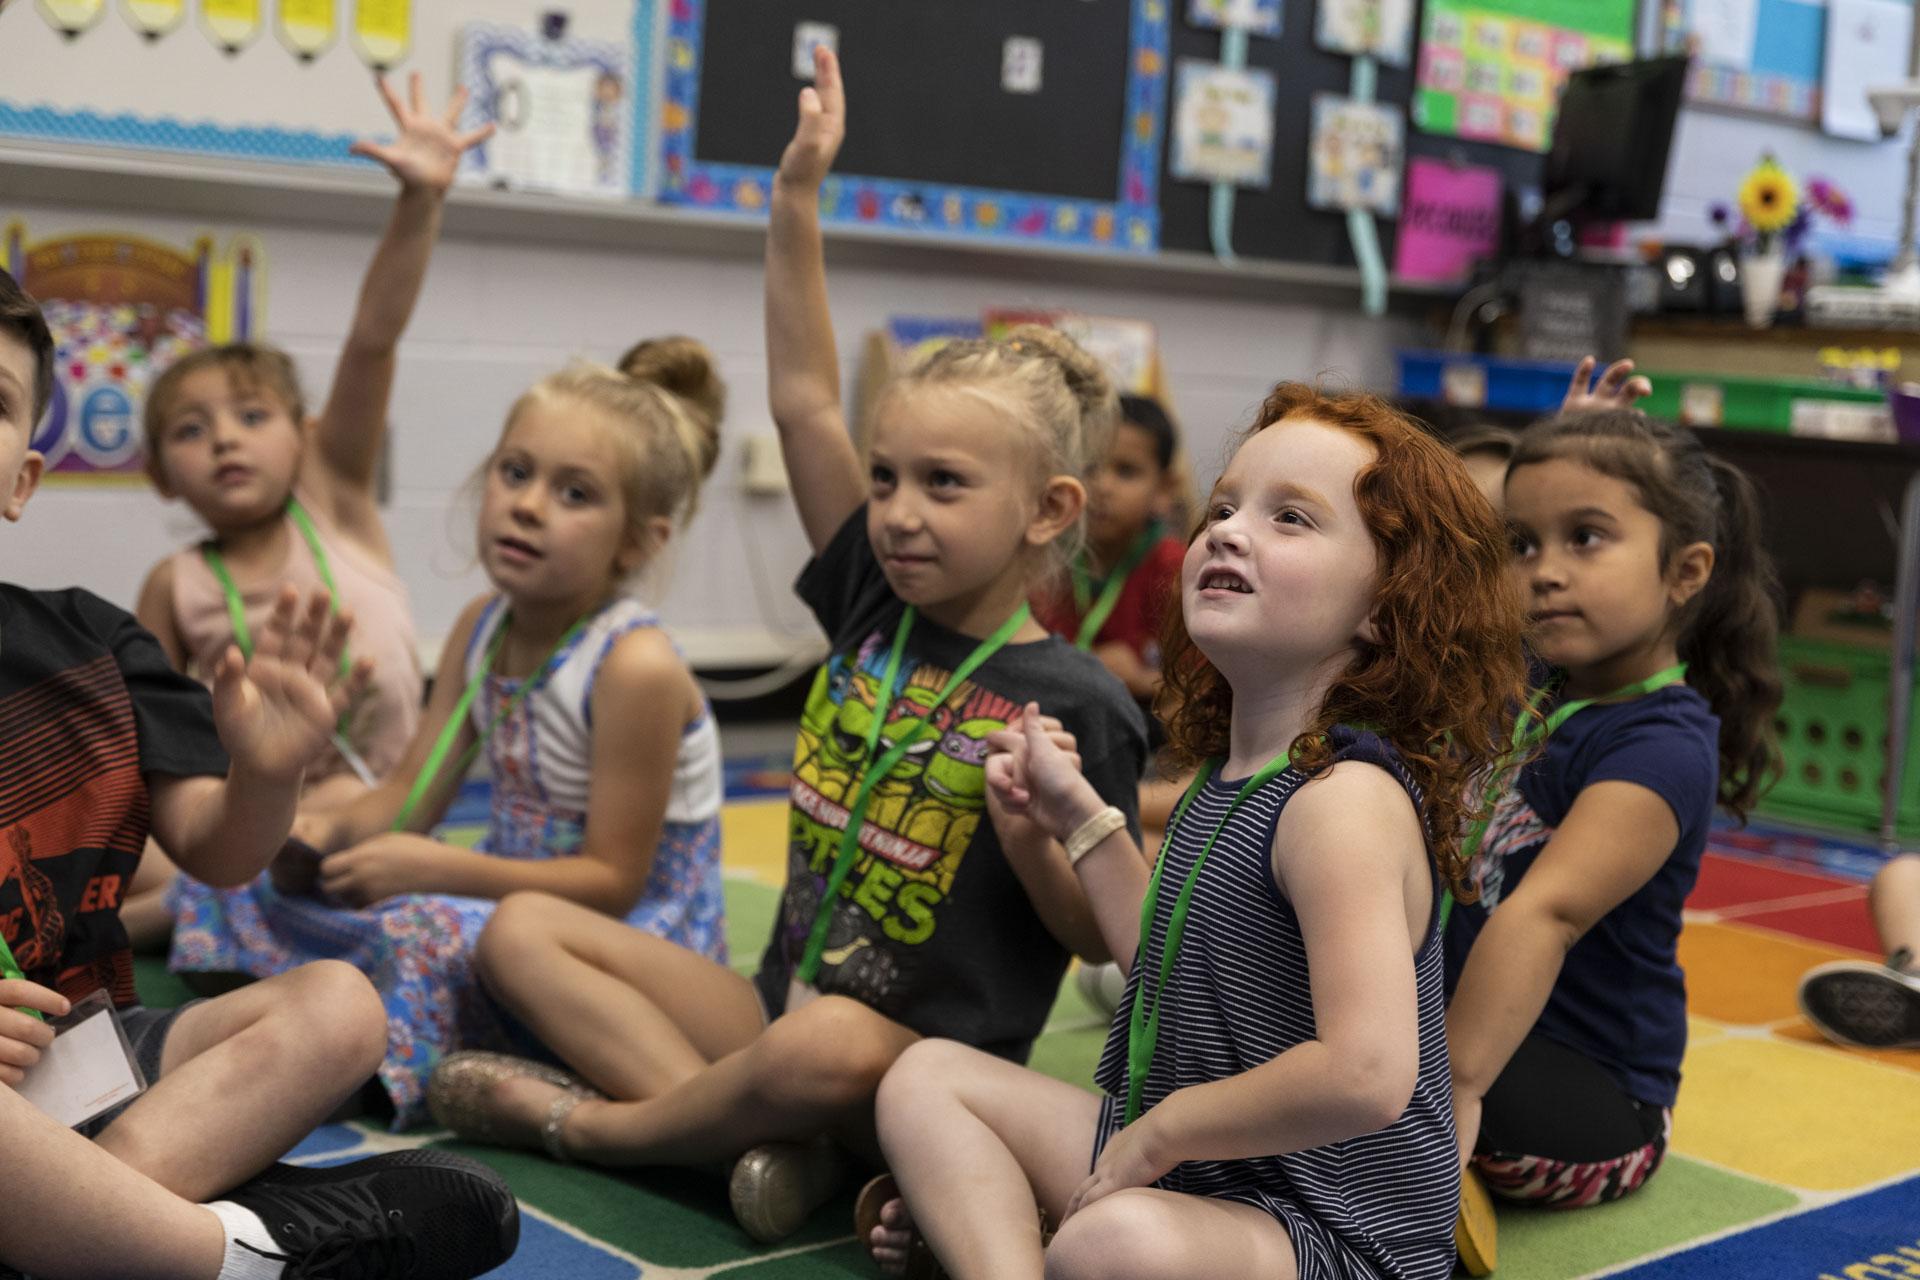 Students sitting on carpet raising hands